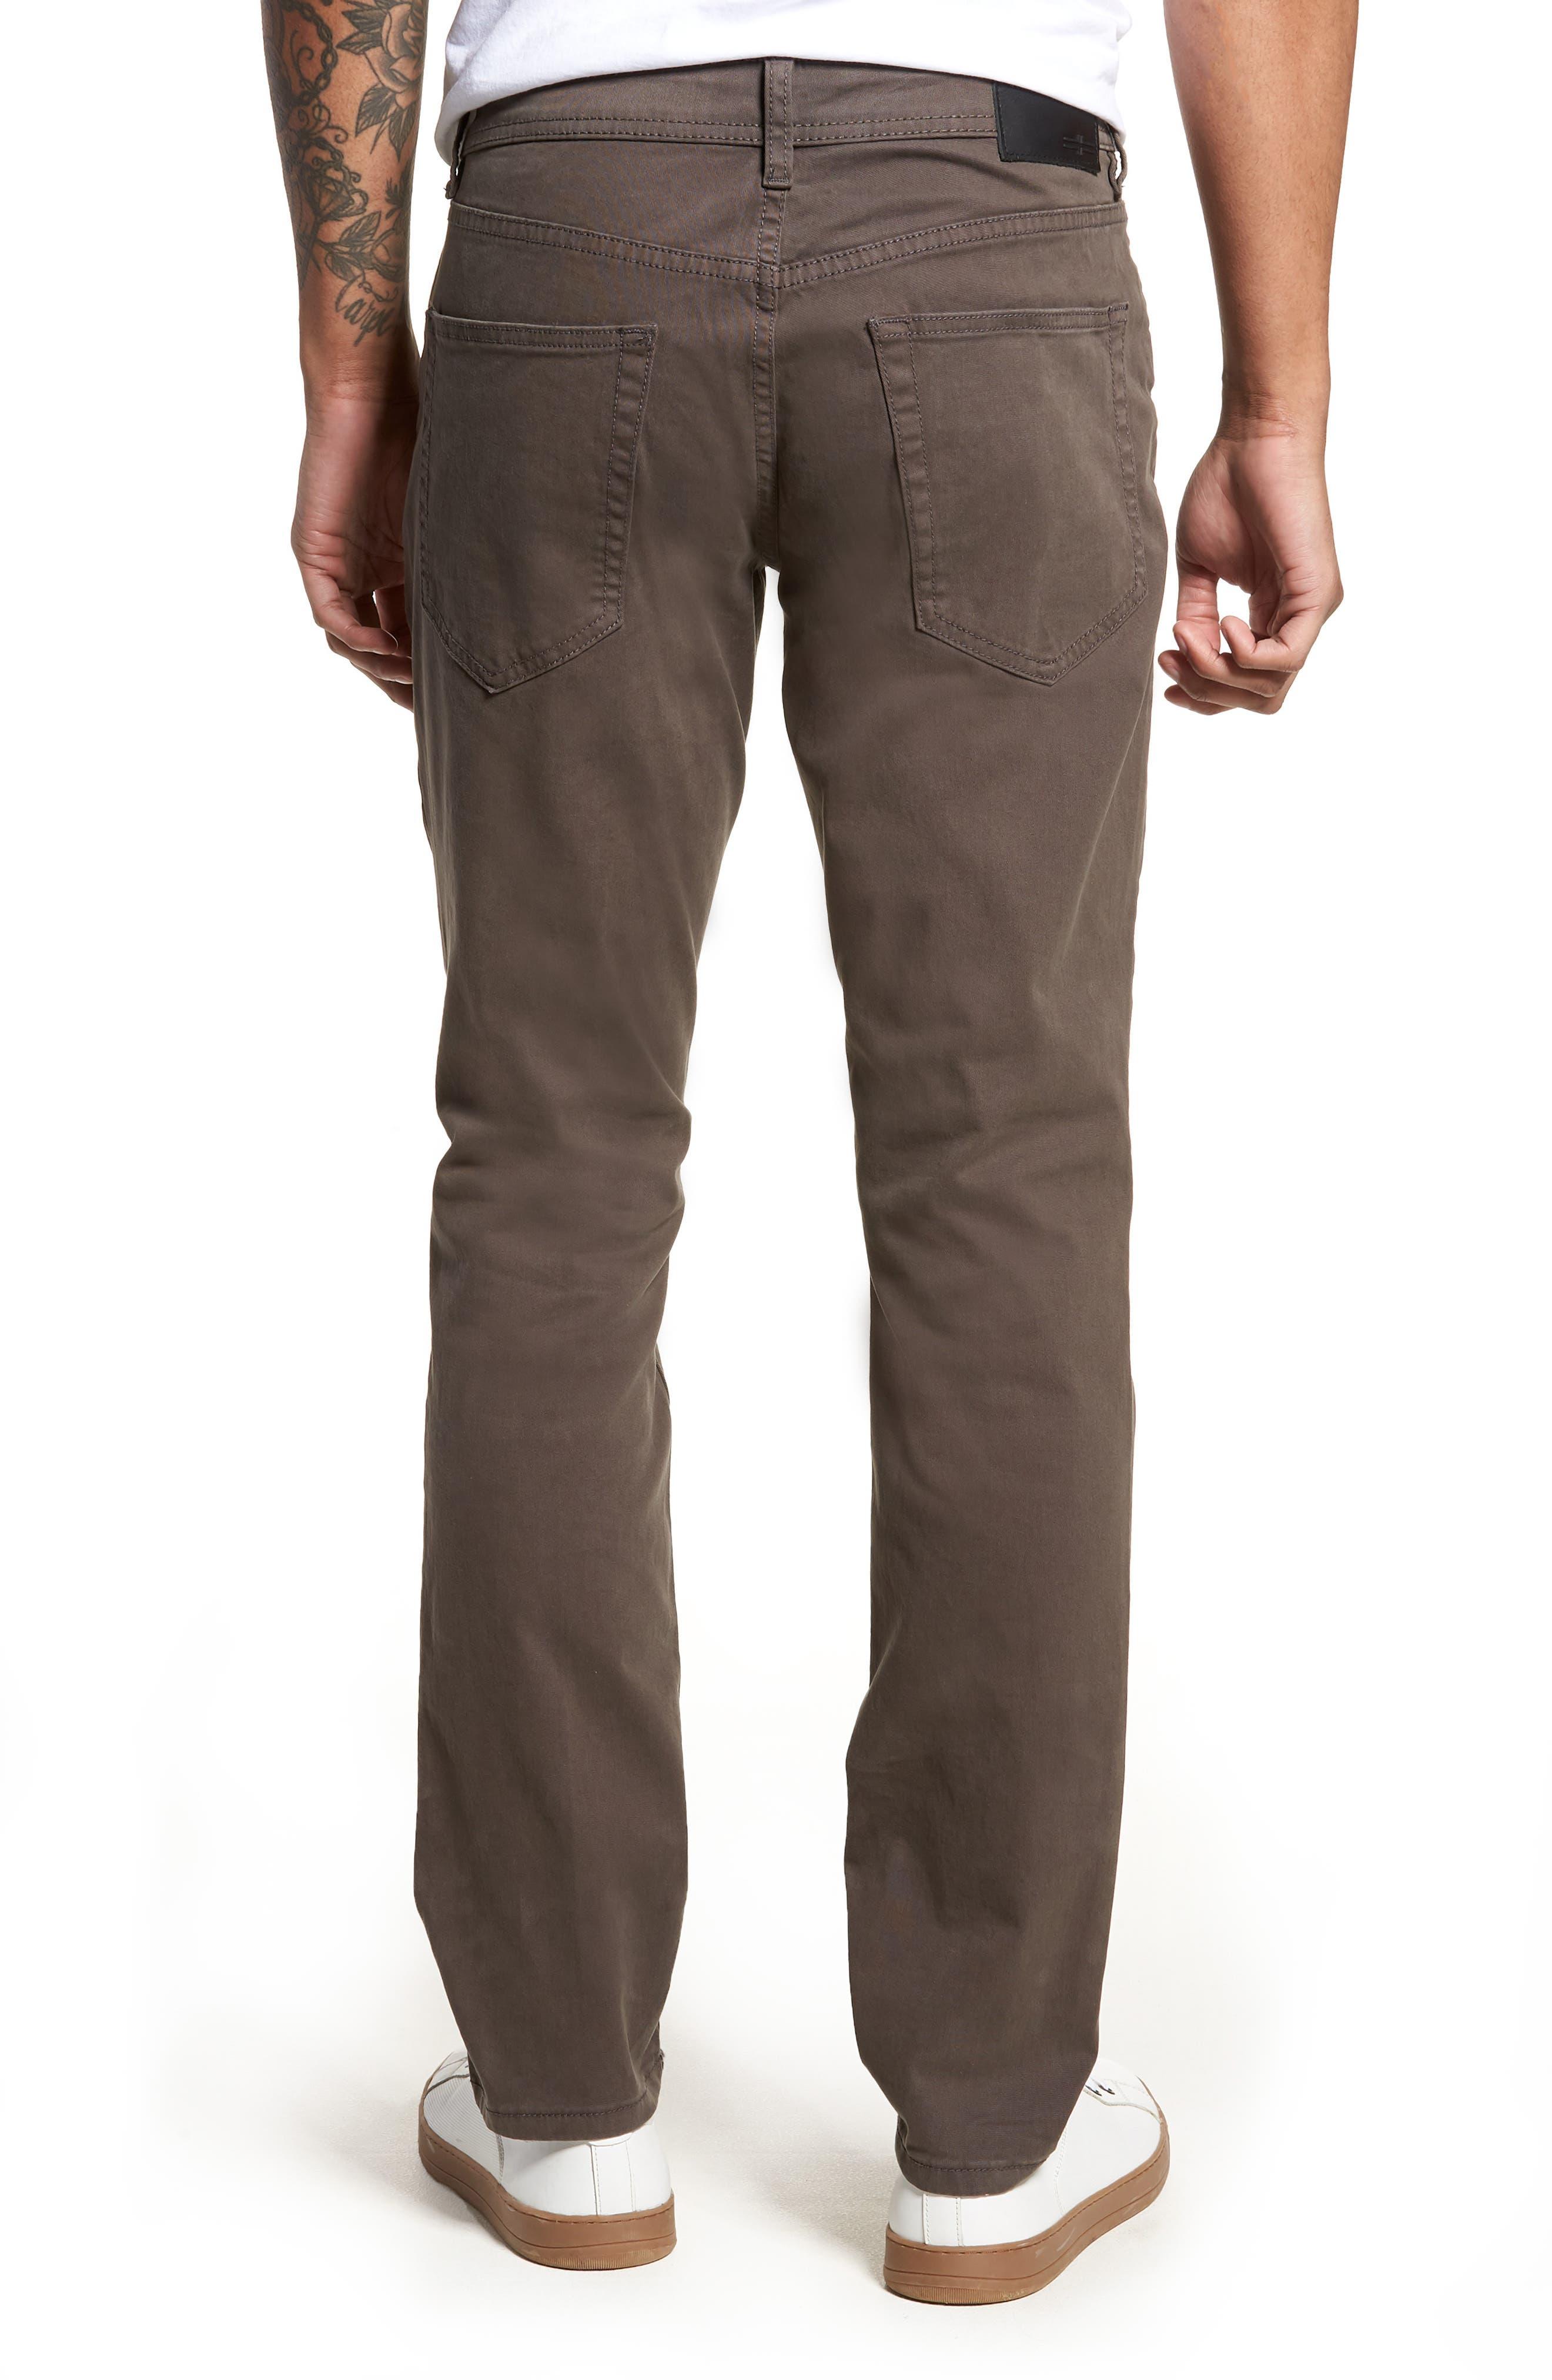 Jeans Co. Kingston Slim Straight Leg Jeans,                             Alternate thumbnail 2, color,                             Deep Earth